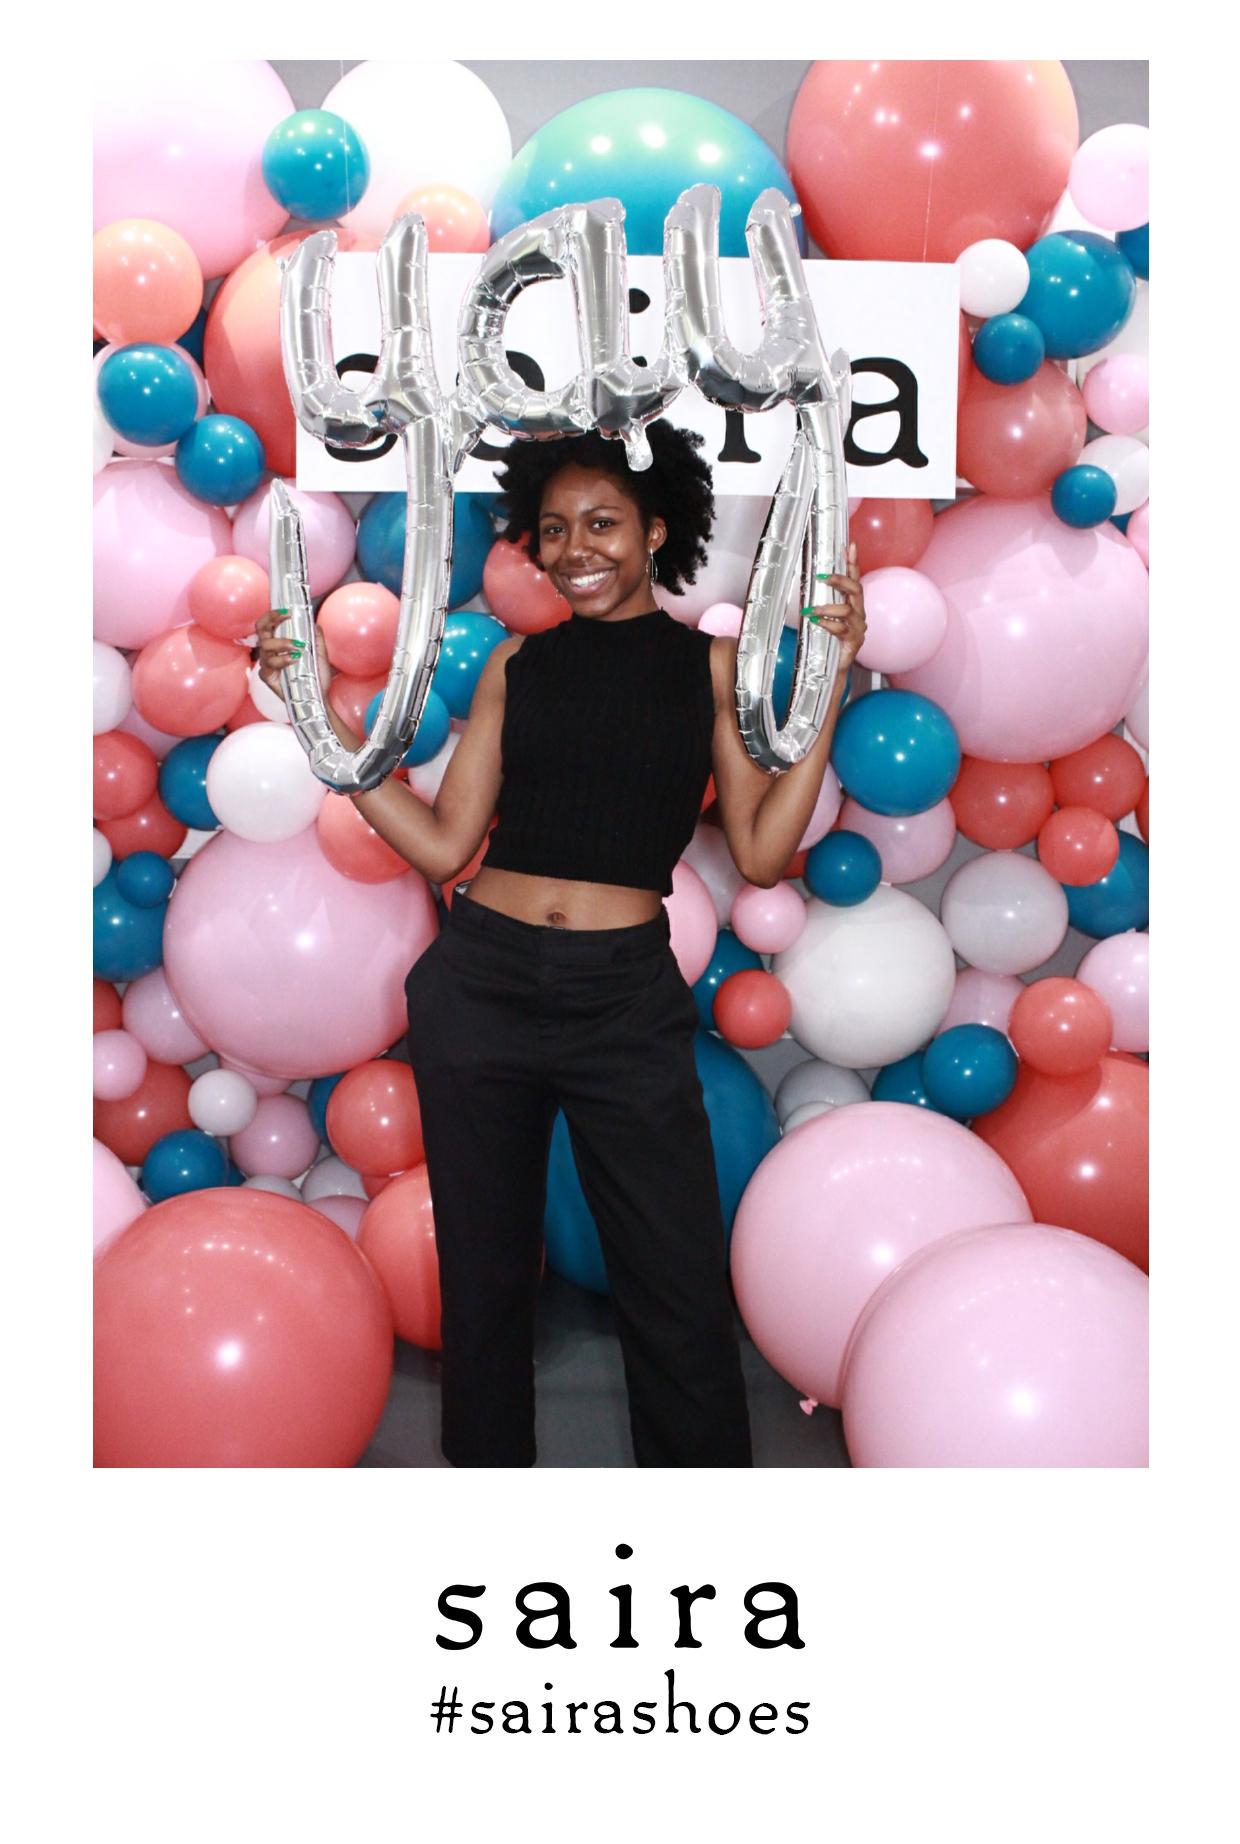 The London Lightbox Balloon Photo Booth